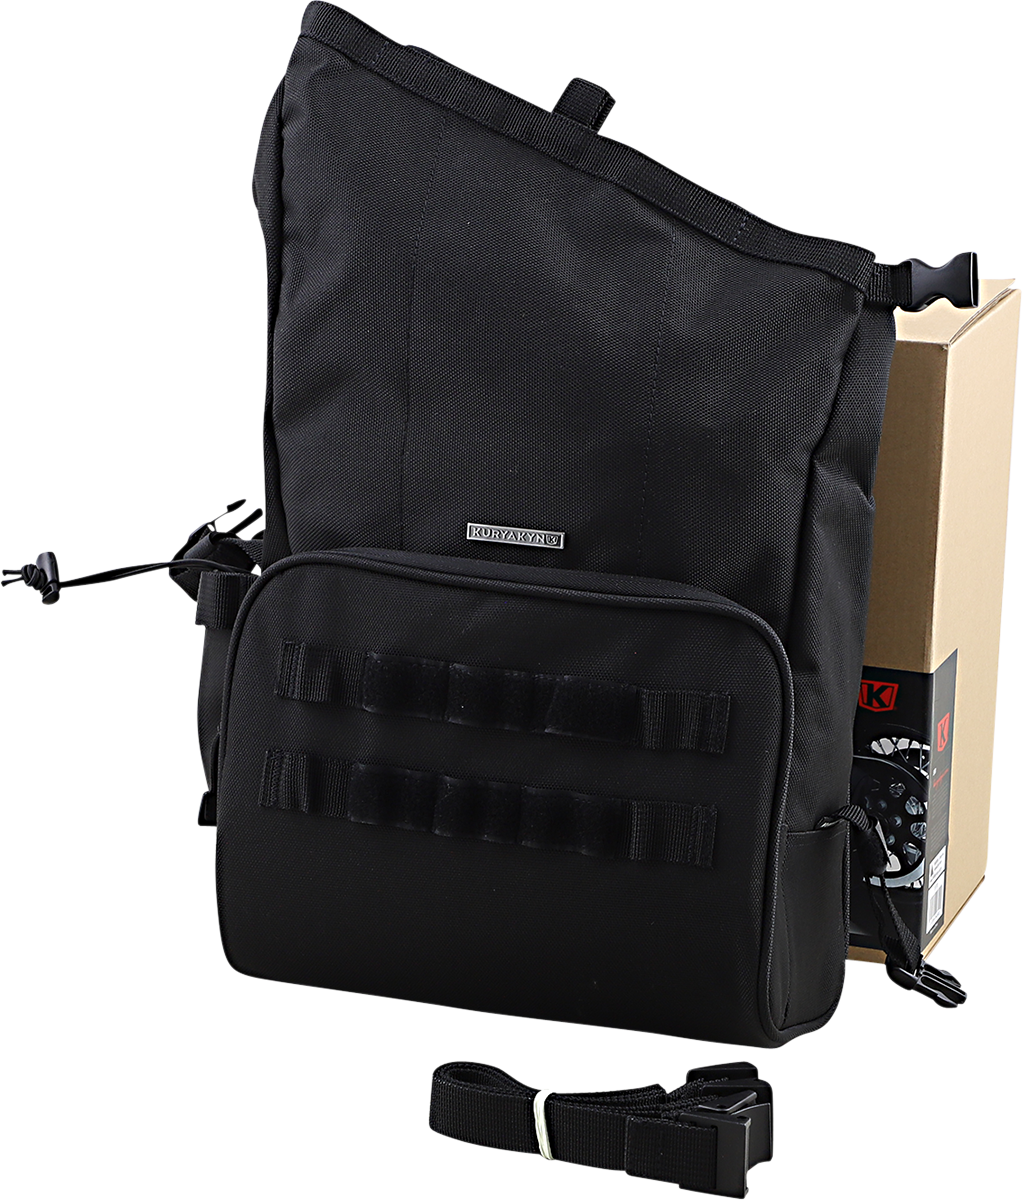 Kuryakyn 5170 Hoodrat Universal Textile Slant Motorcycle Black Swing Arm Bag